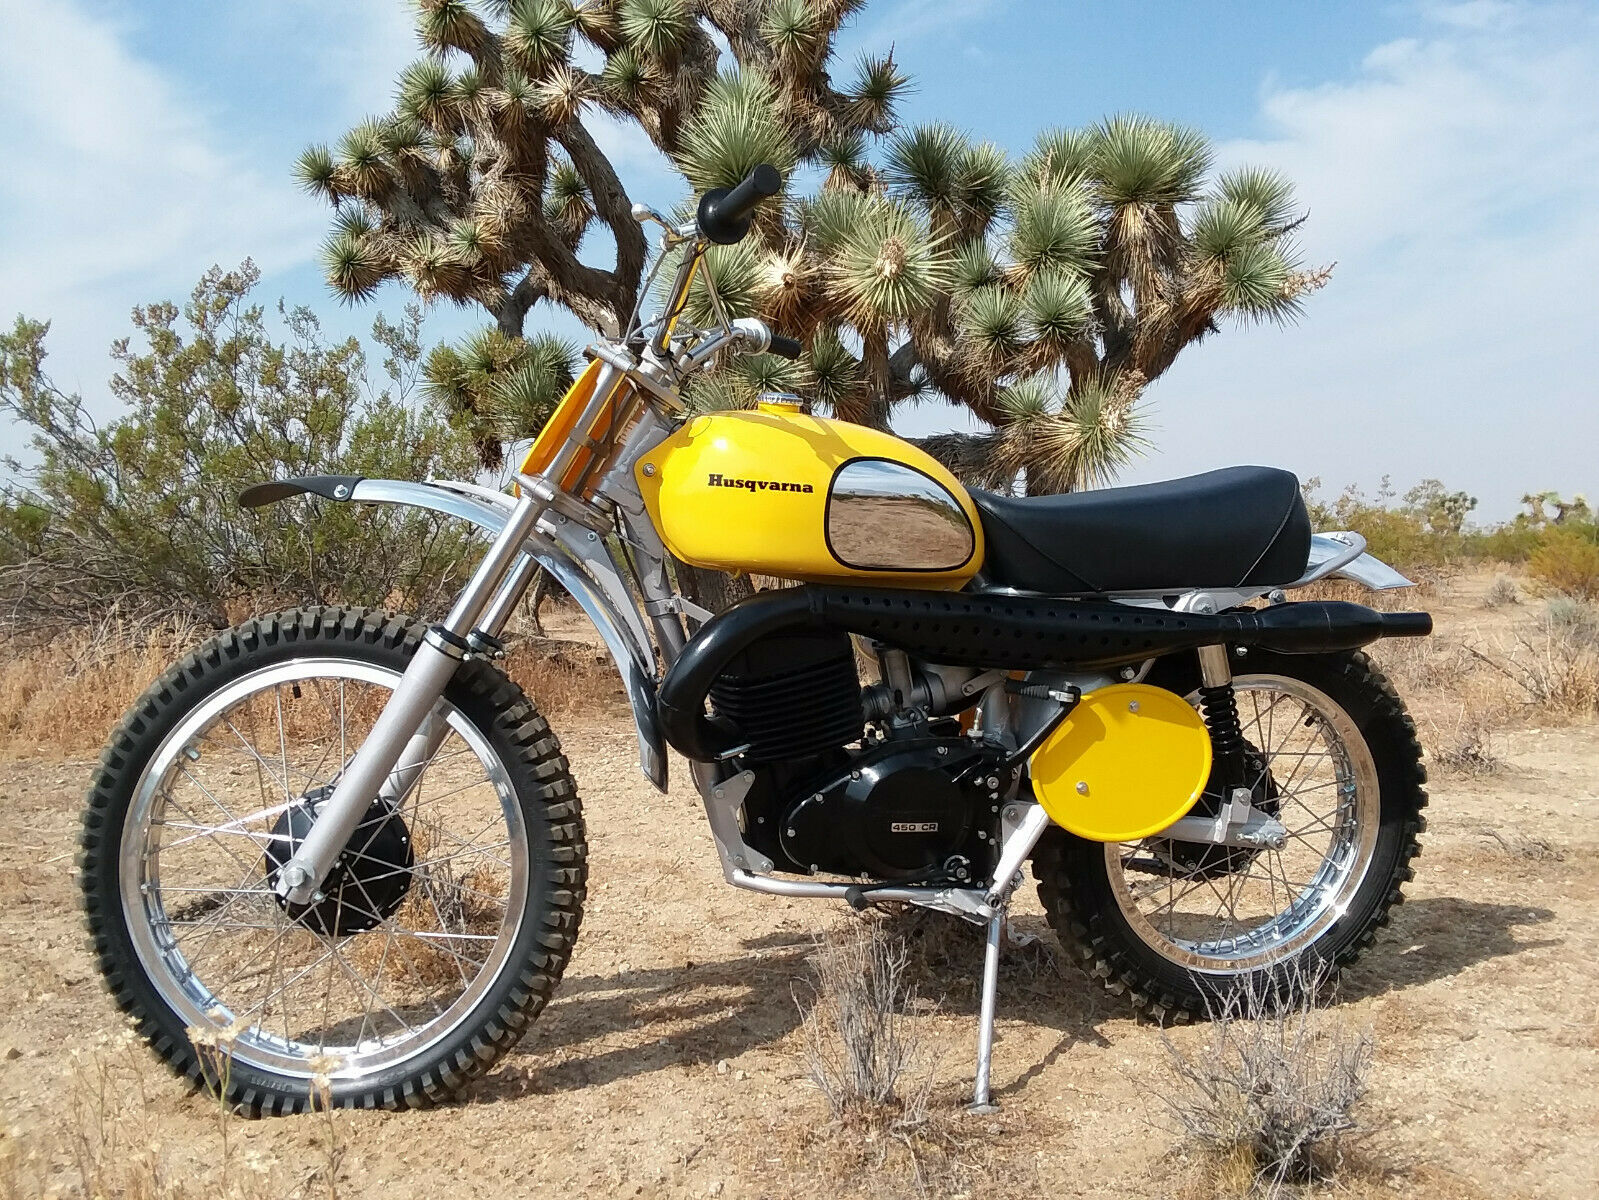 Picture of A 1973 Husqvarna Desert Master 450